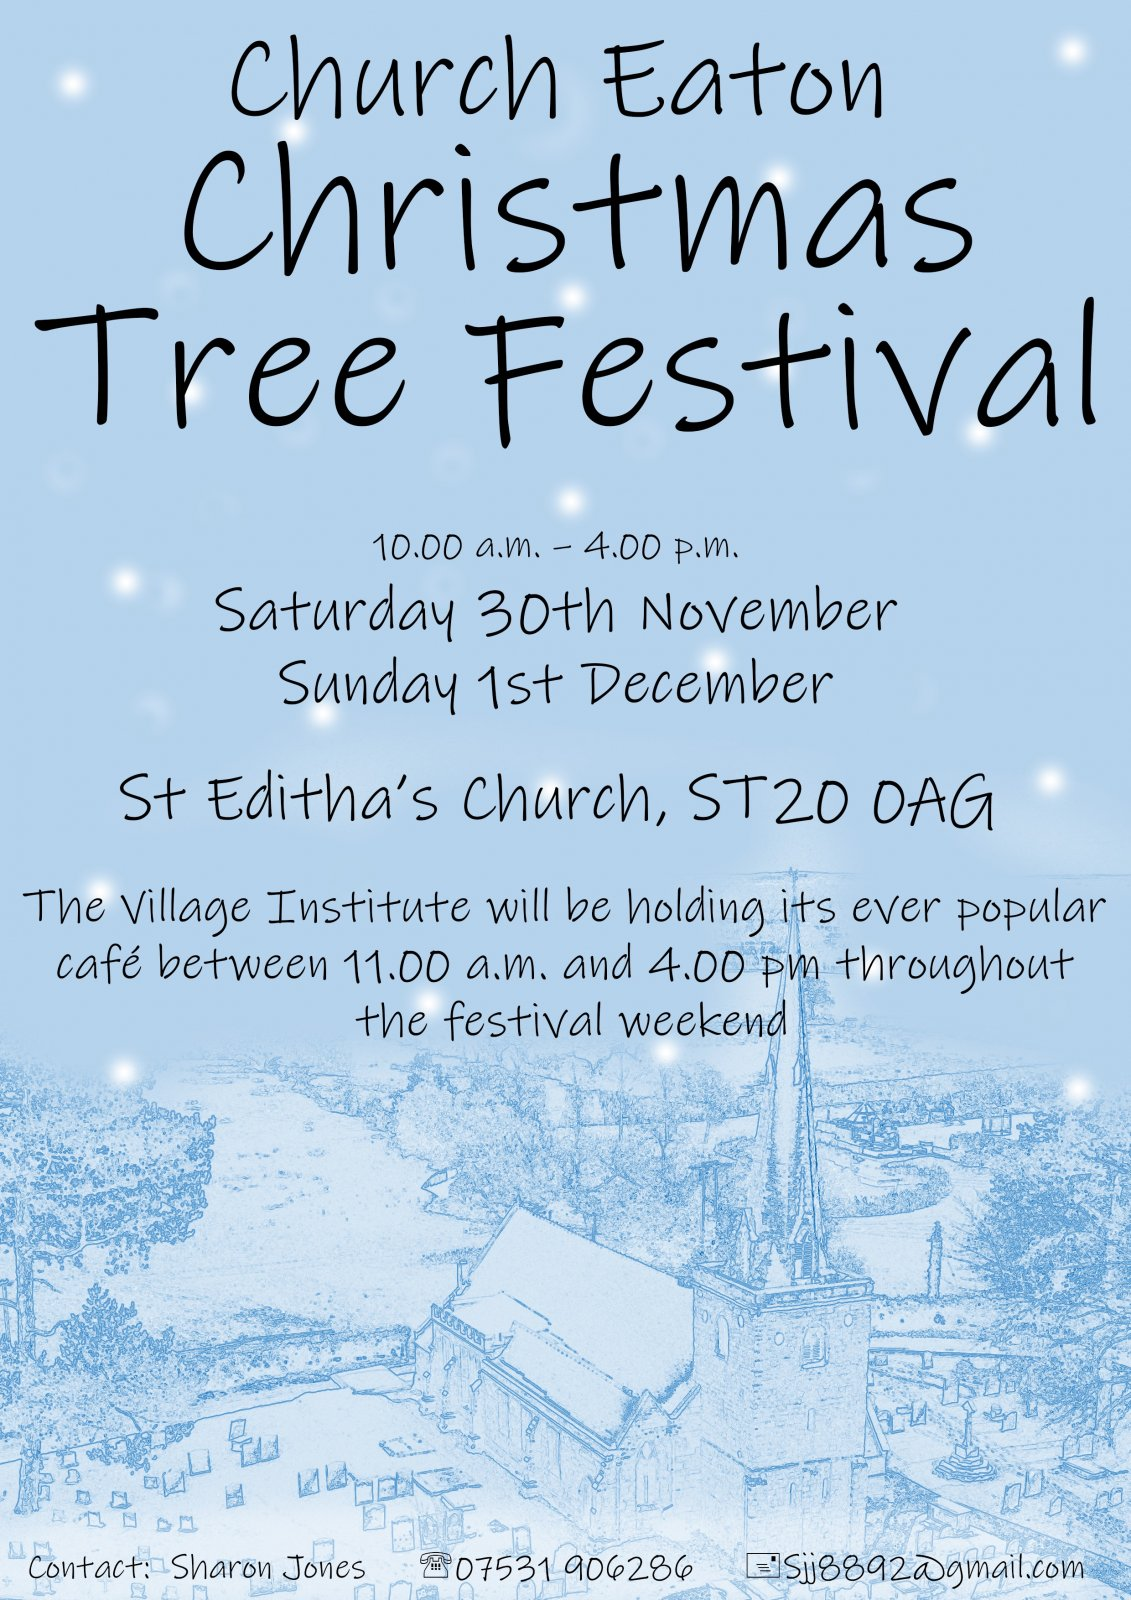 Church Eaton Christmas Tree Festival Poster - Updated.jpg